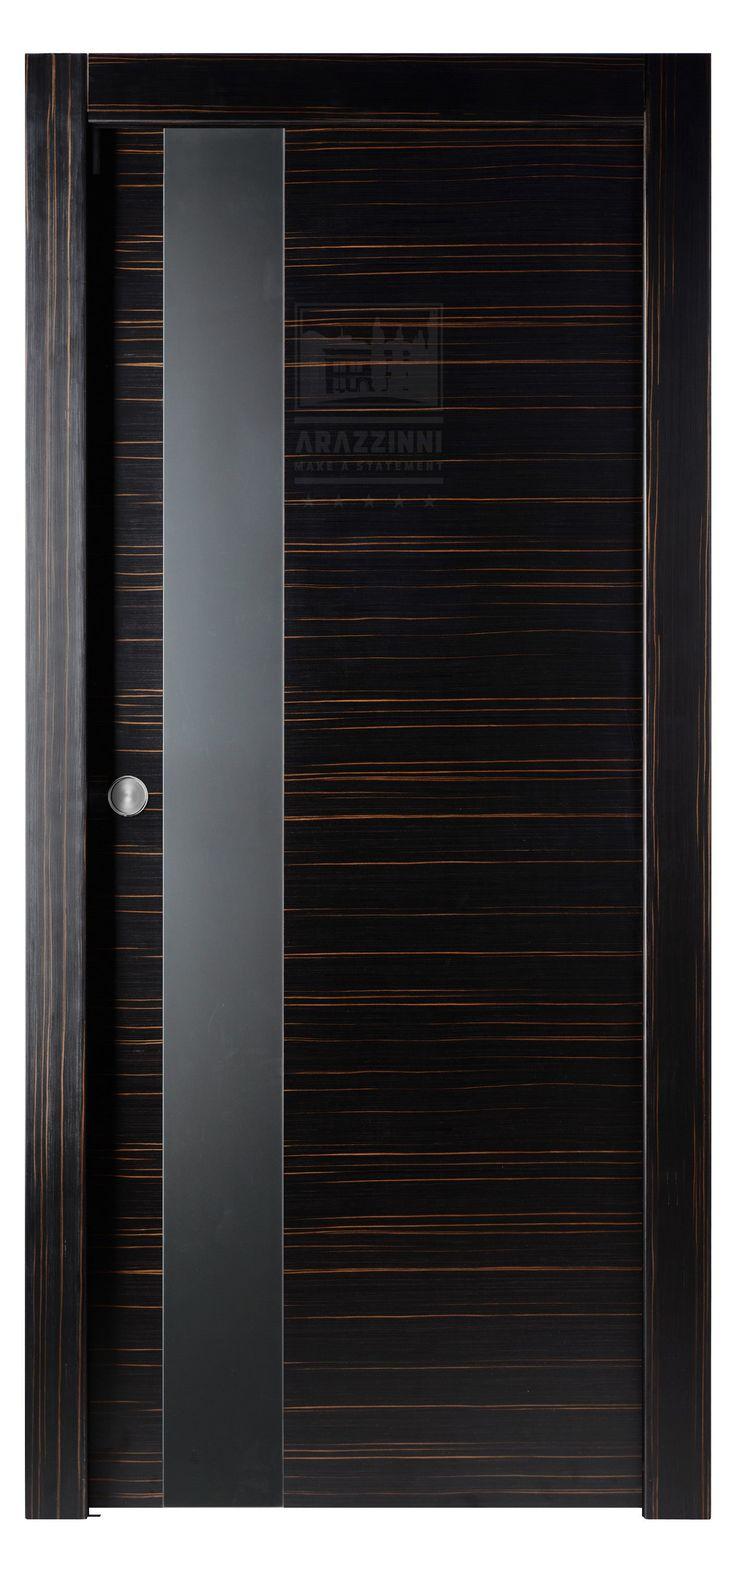 150 best images about 1000 venetian on pinterest wine - Modern pocket doors interior ...